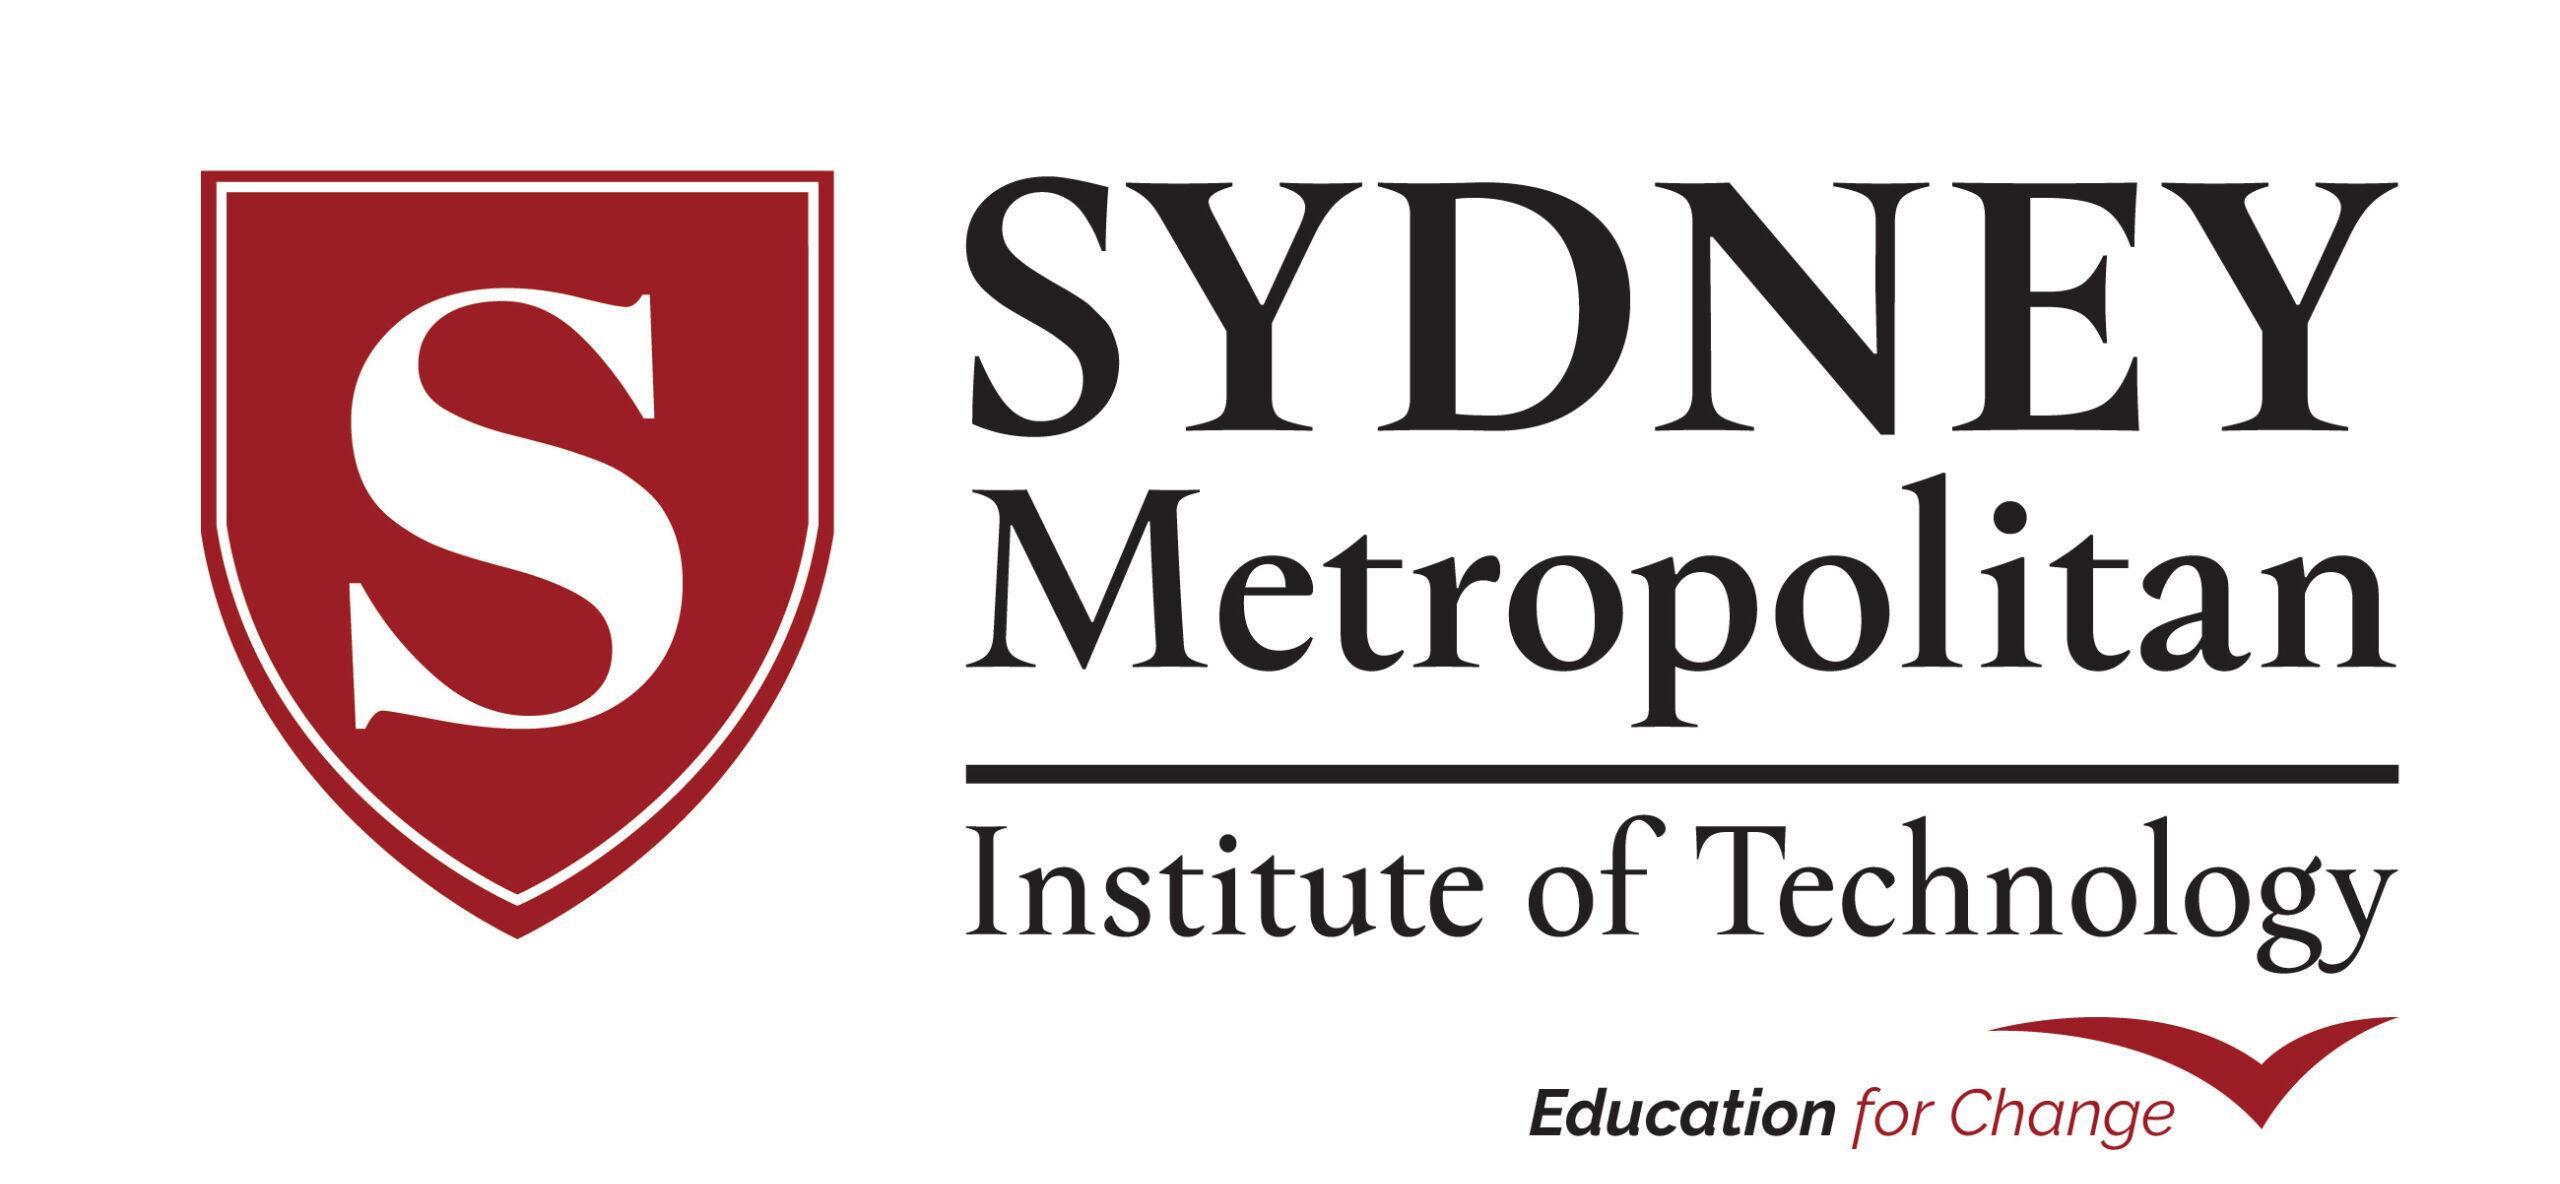 Sydney Metropolitan Institute of Technology (Sydney Met)